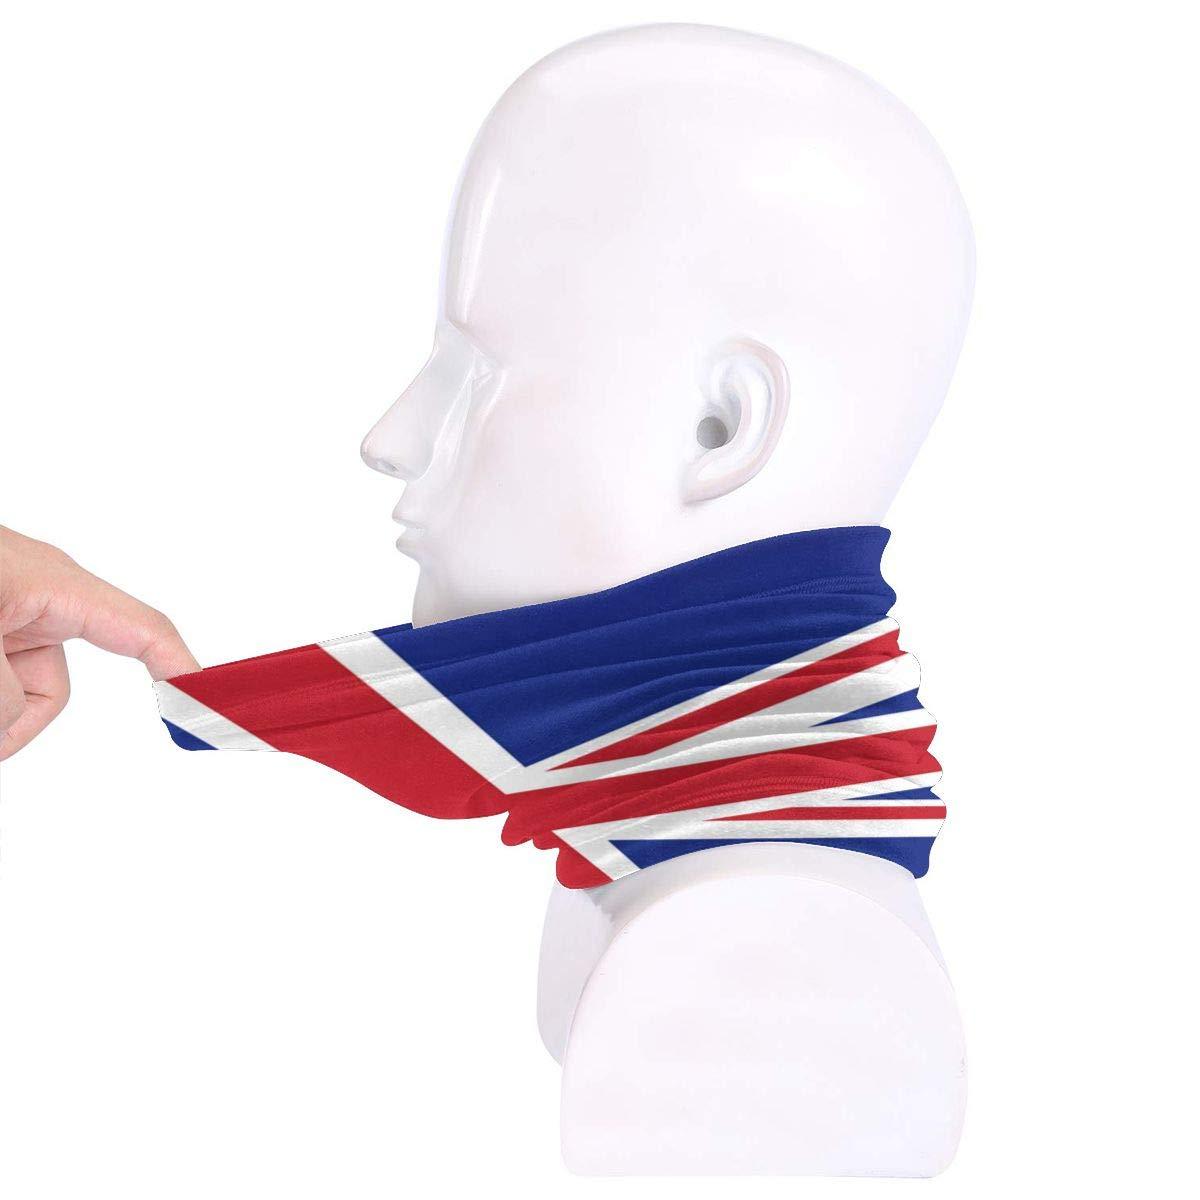 LDDDP British Flag Neck Warmer Anti-UV Neck Gaiter Windproof Fleece Neck Warmer Heavyweight Multifunctional Ski Mask Winter Outdoor Accessories